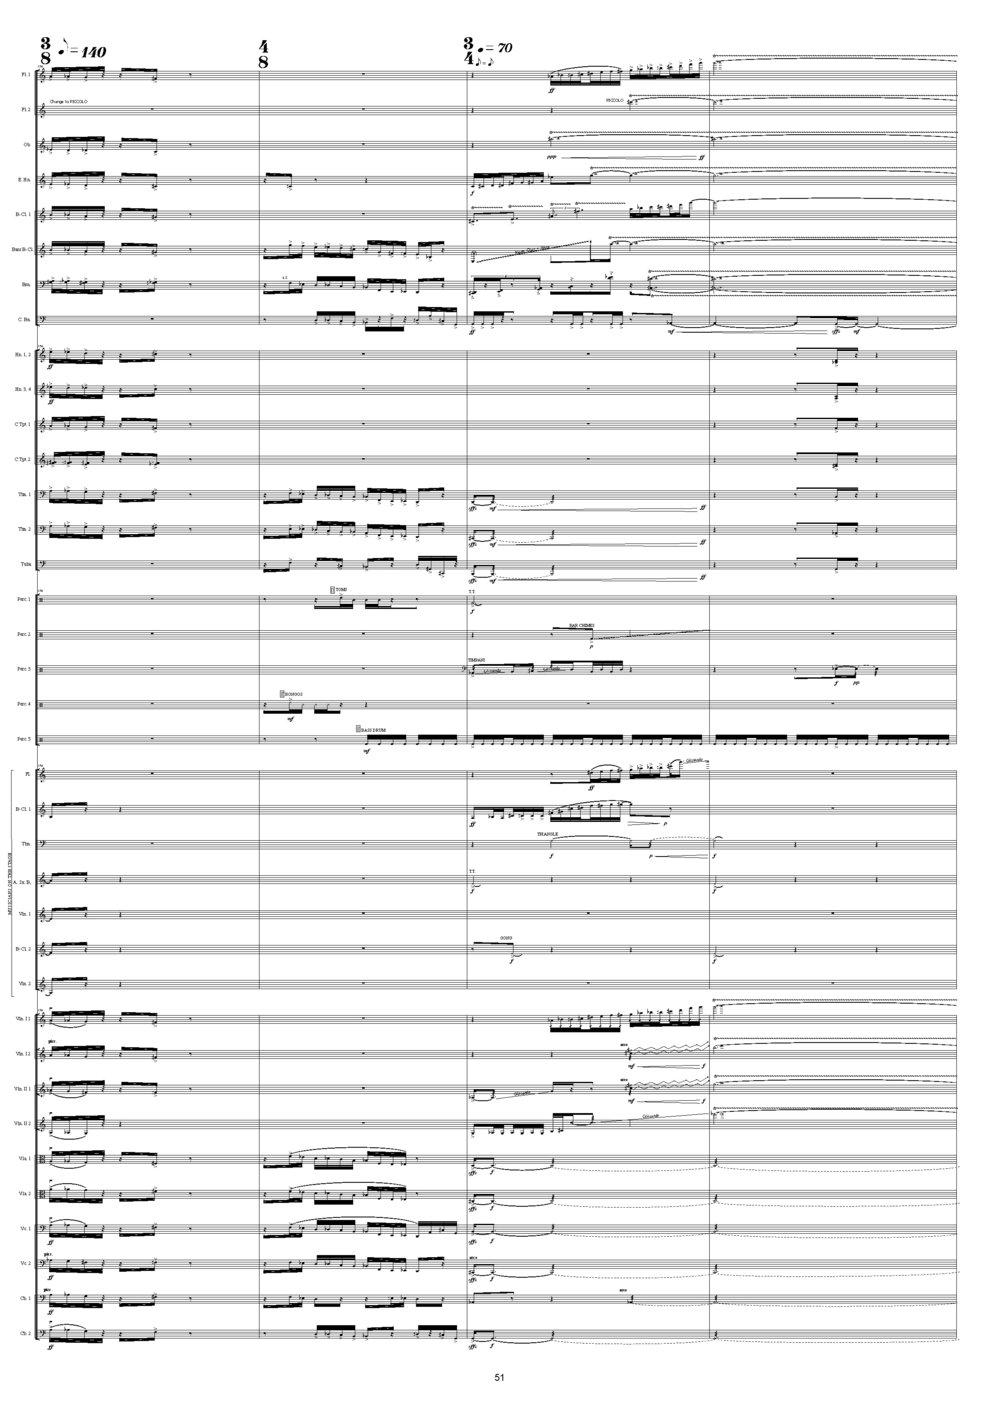 METANOIA_2009-RAPPOPORT_Seite_51.jpg